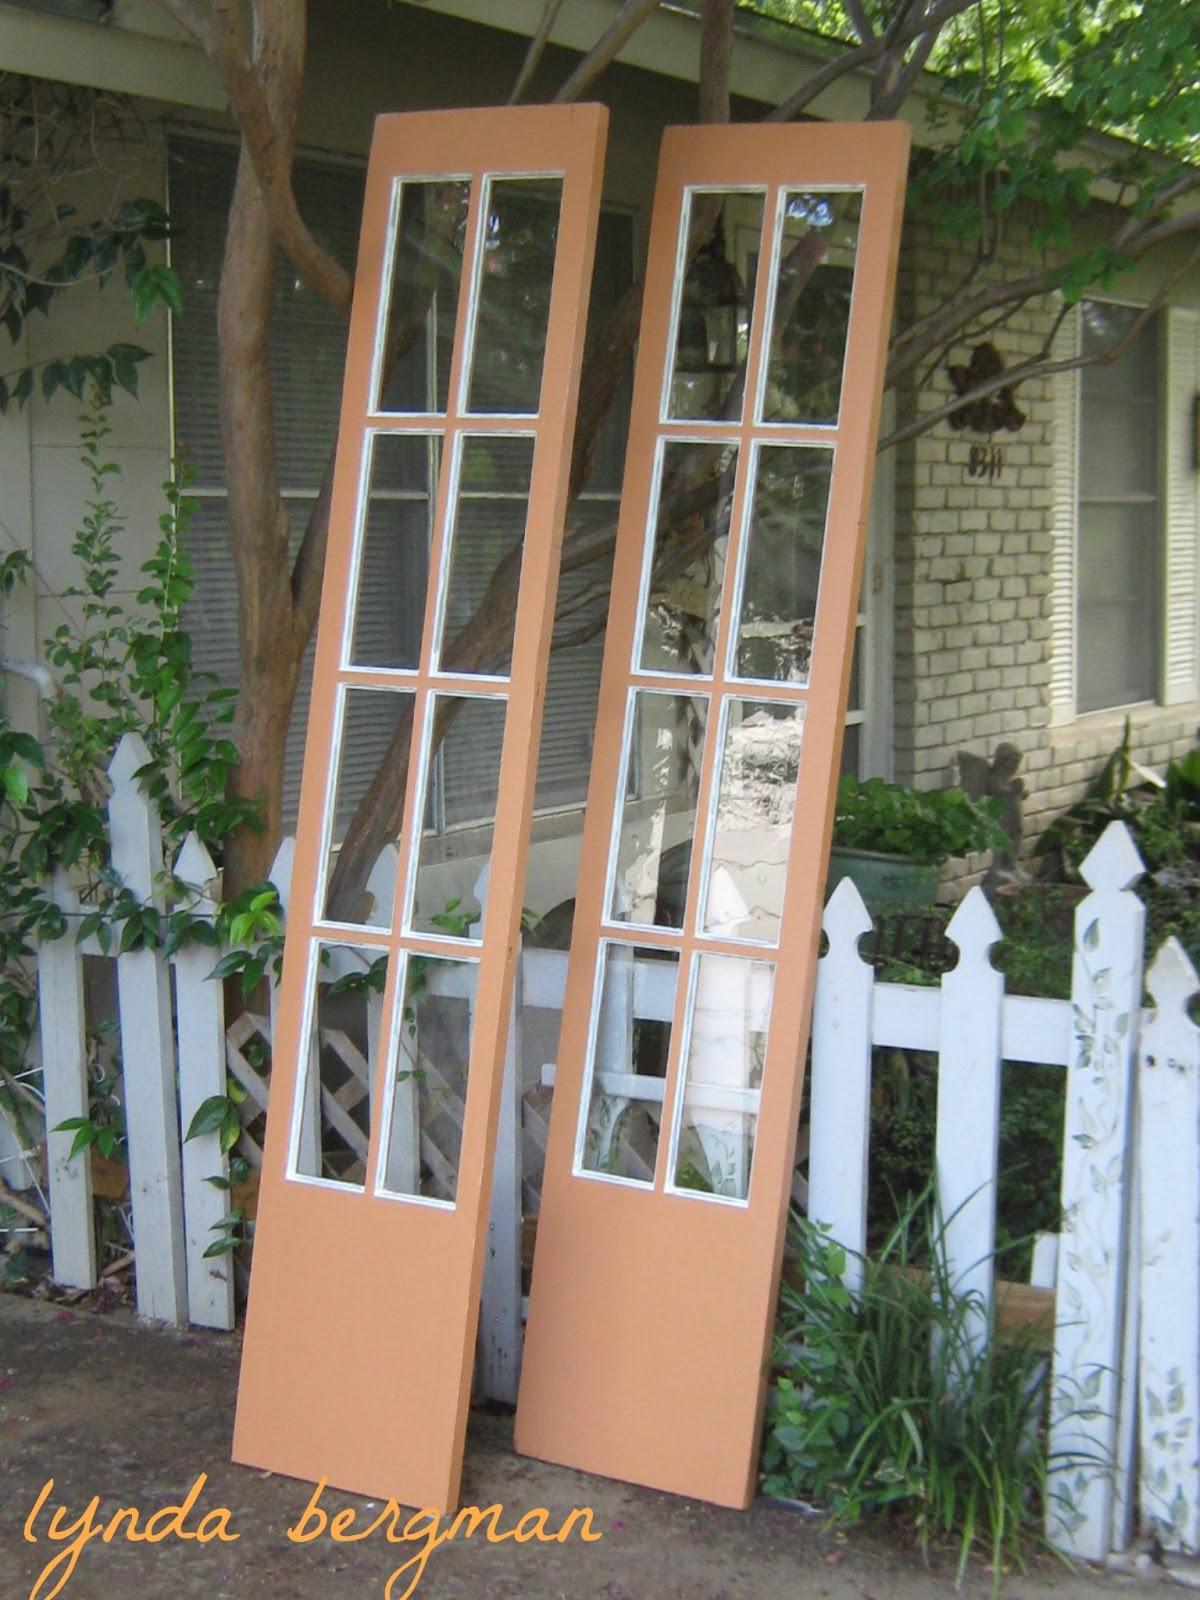 Lynda bergman decorative artisan orange french doors for for Narrow interior french doors